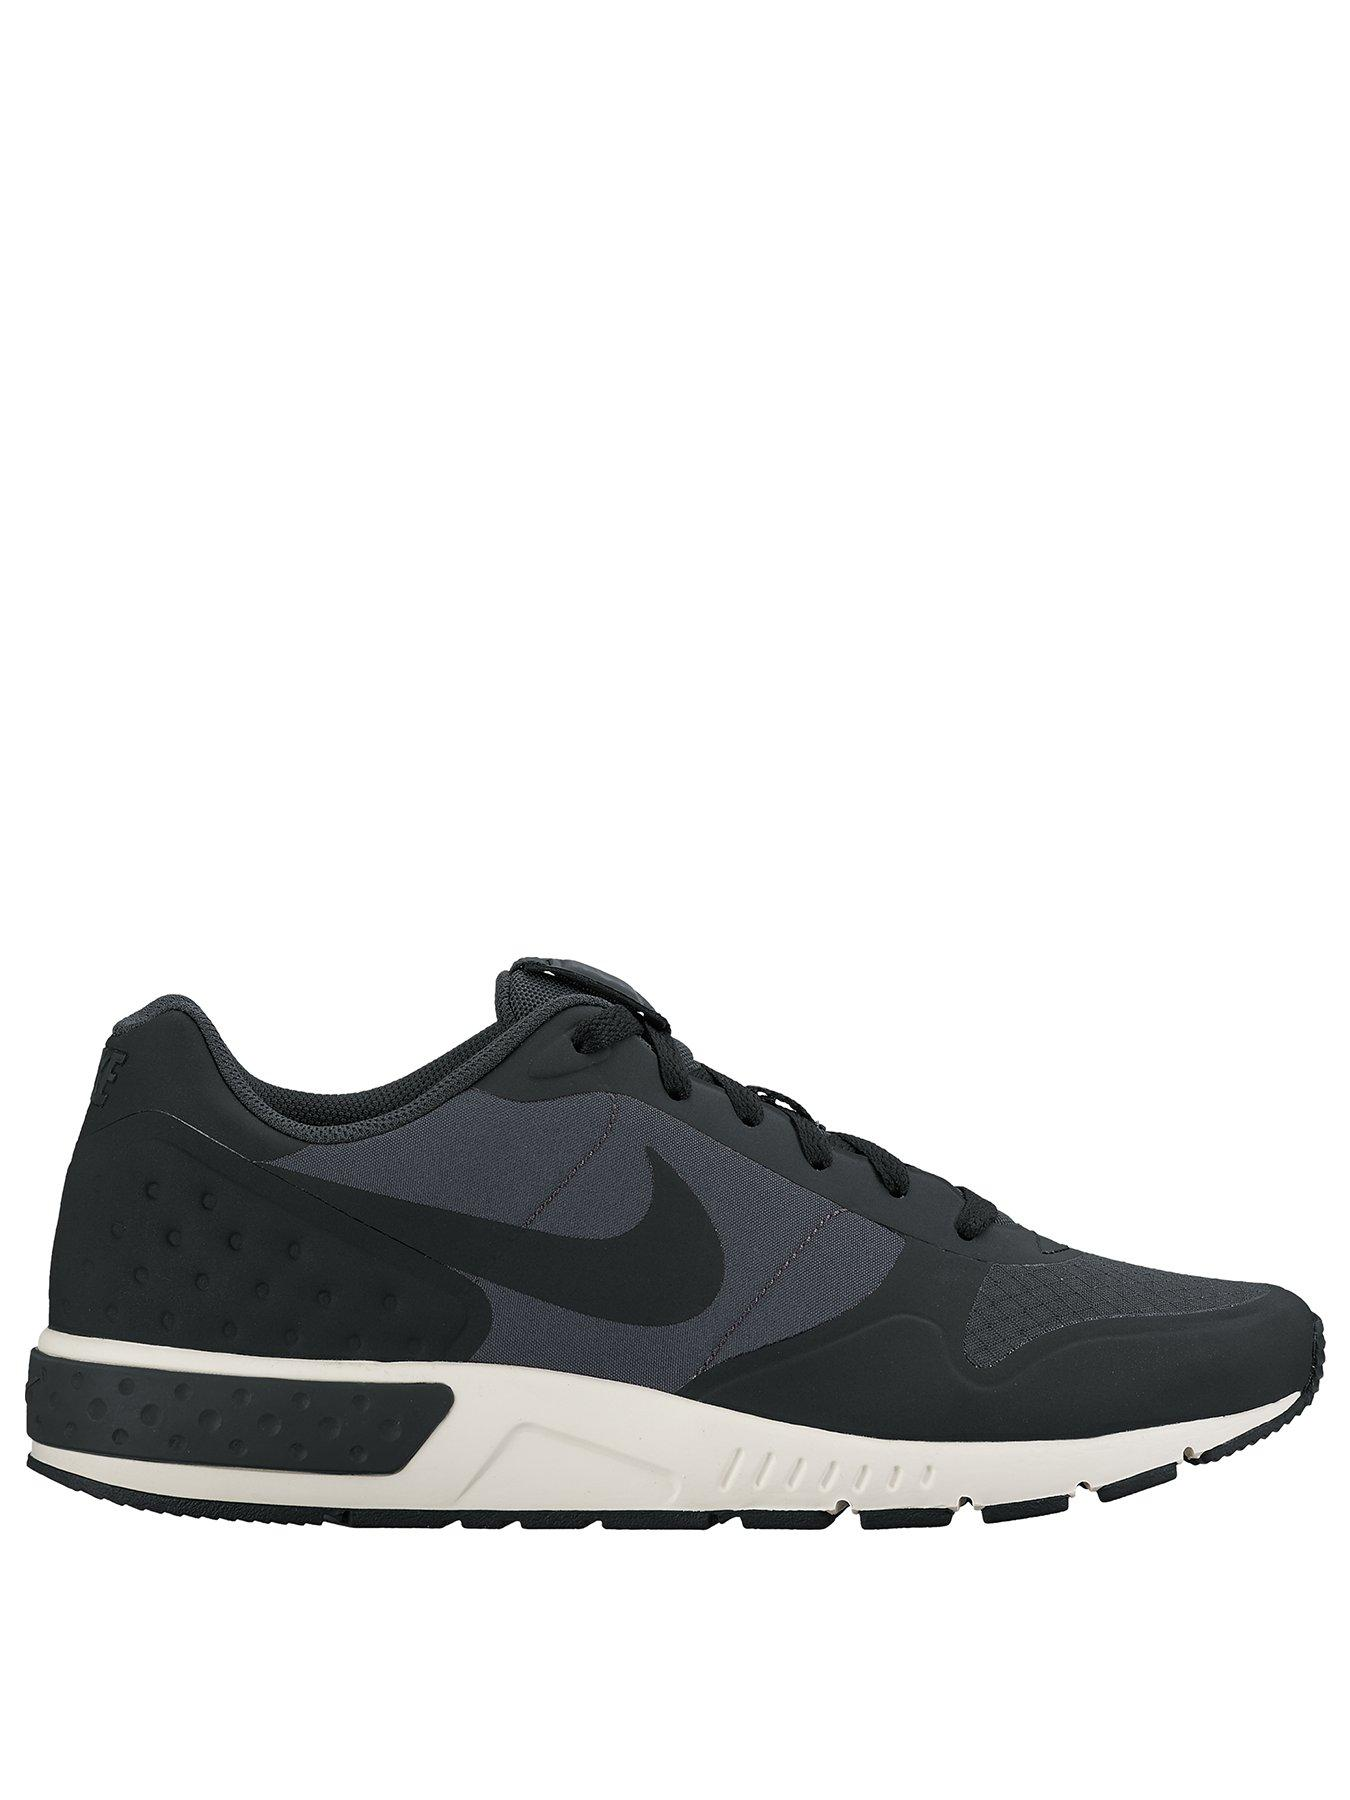 Nike Nightgazer LW 1600074803 Men's Shoes Nike Trainers